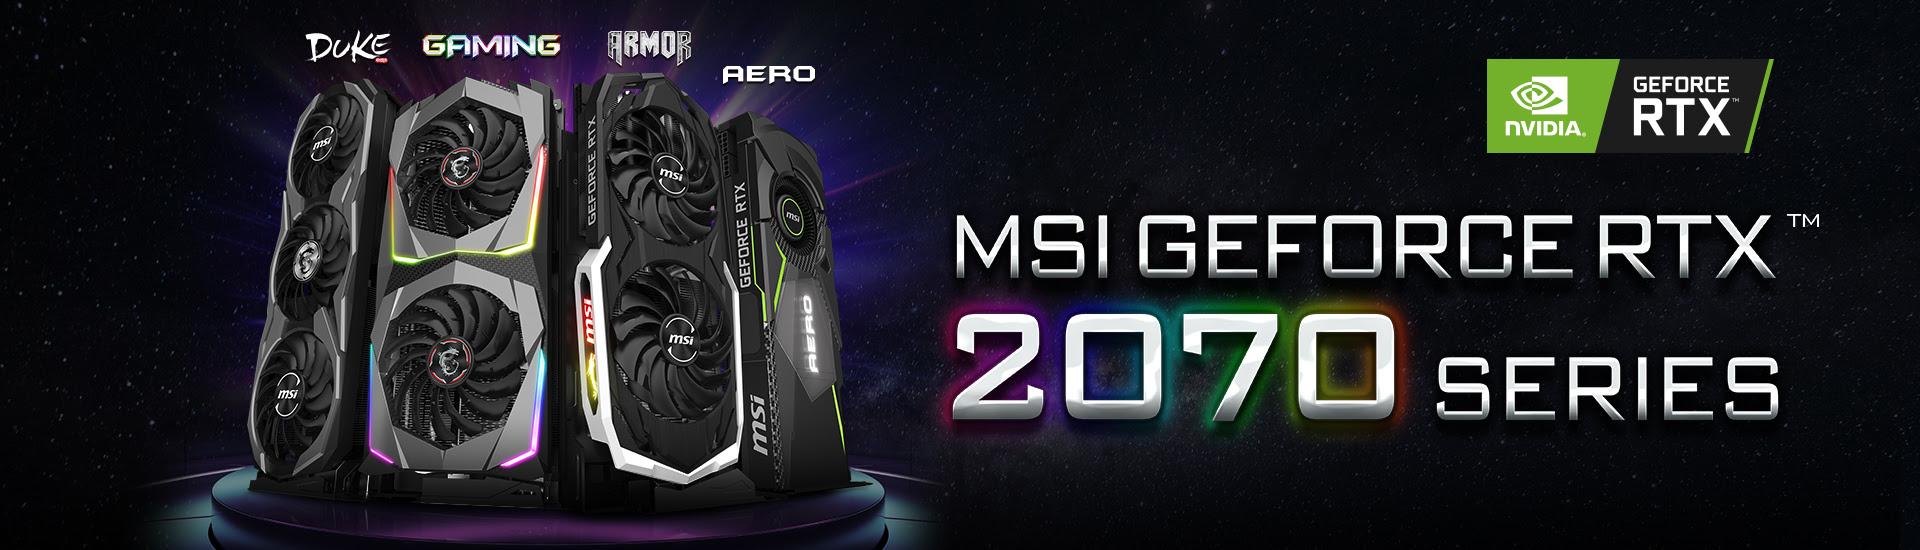 MSI Announces Custom GeForce RTX 2070 Graphics Cards - Legit Reviews